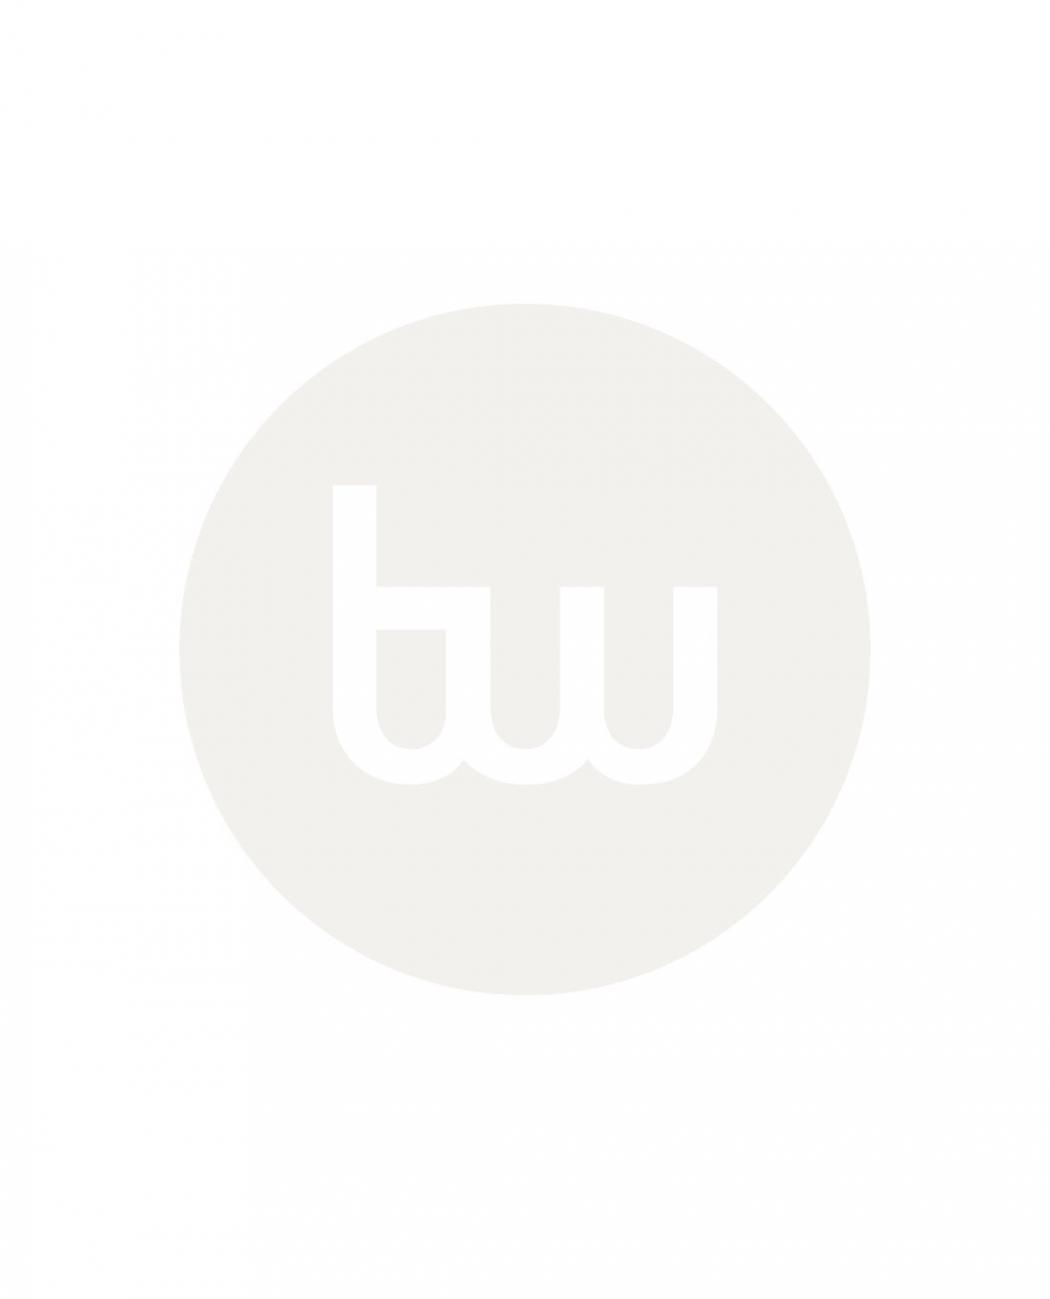 Tolle Oakely M Rahmen Bilder - Benutzerdefinierte Bilderrahmen Ideen ...